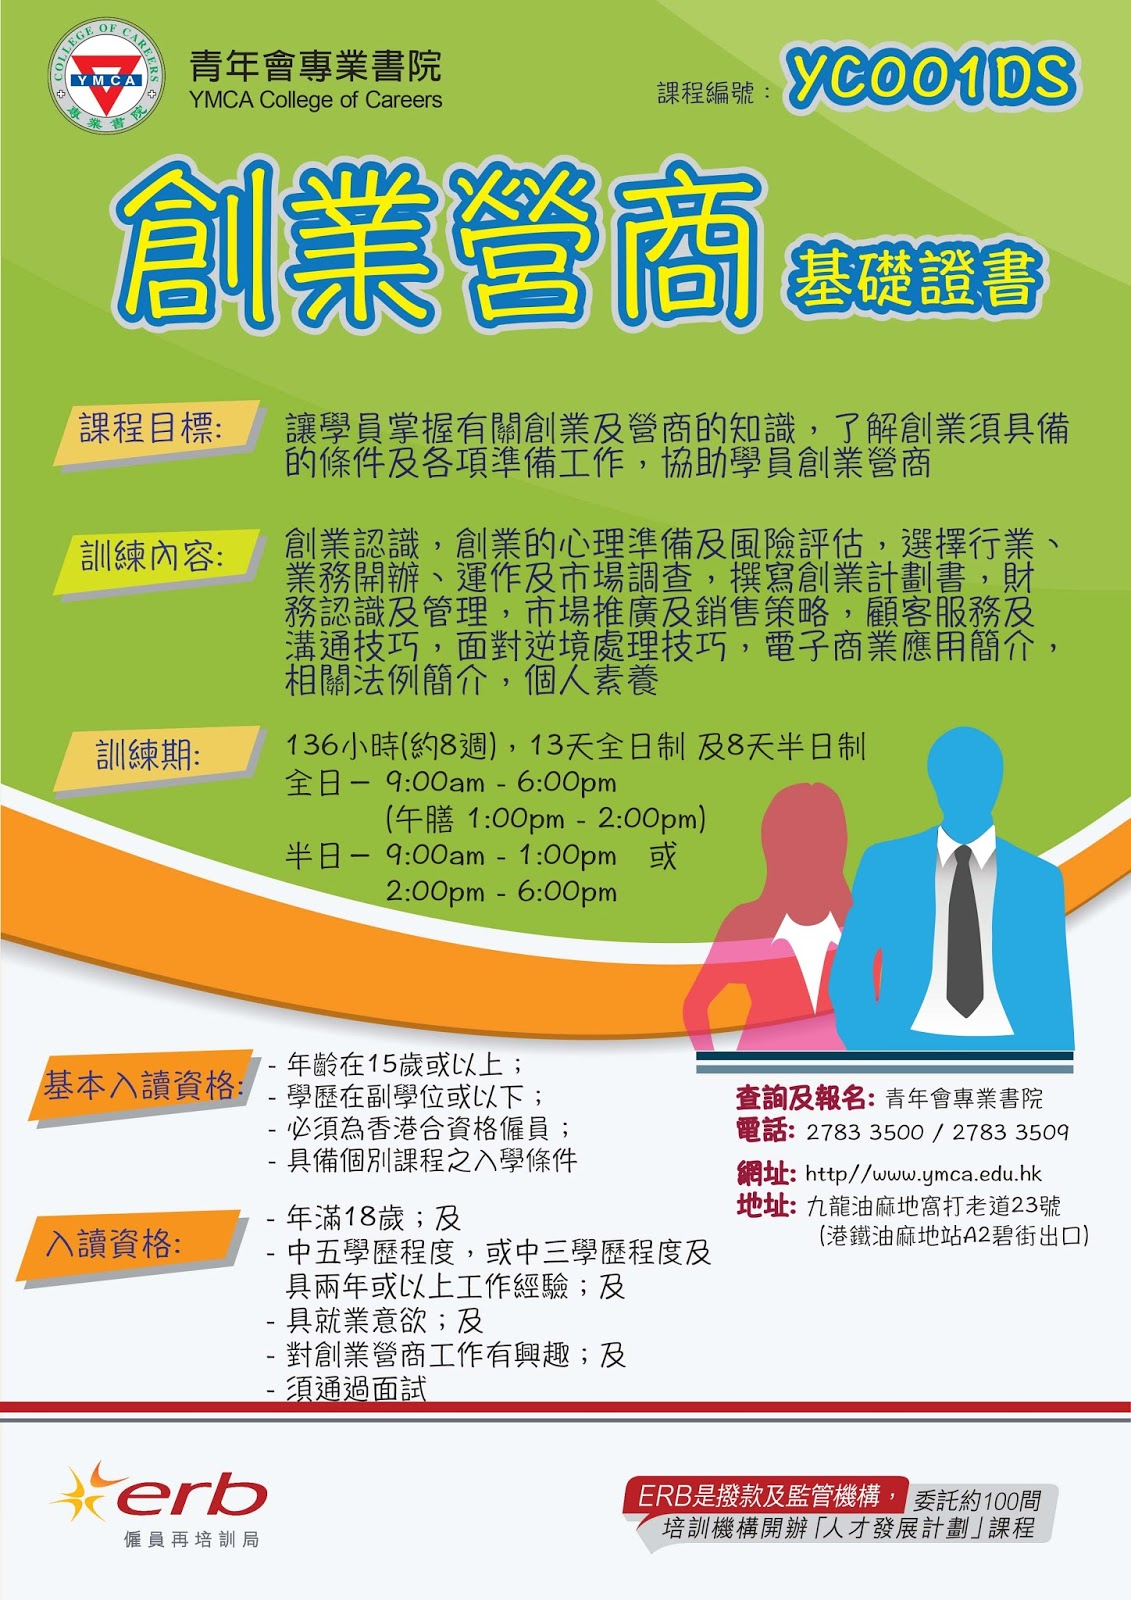 YMCA 持續教育: ERB課程:創業營商基礎證書